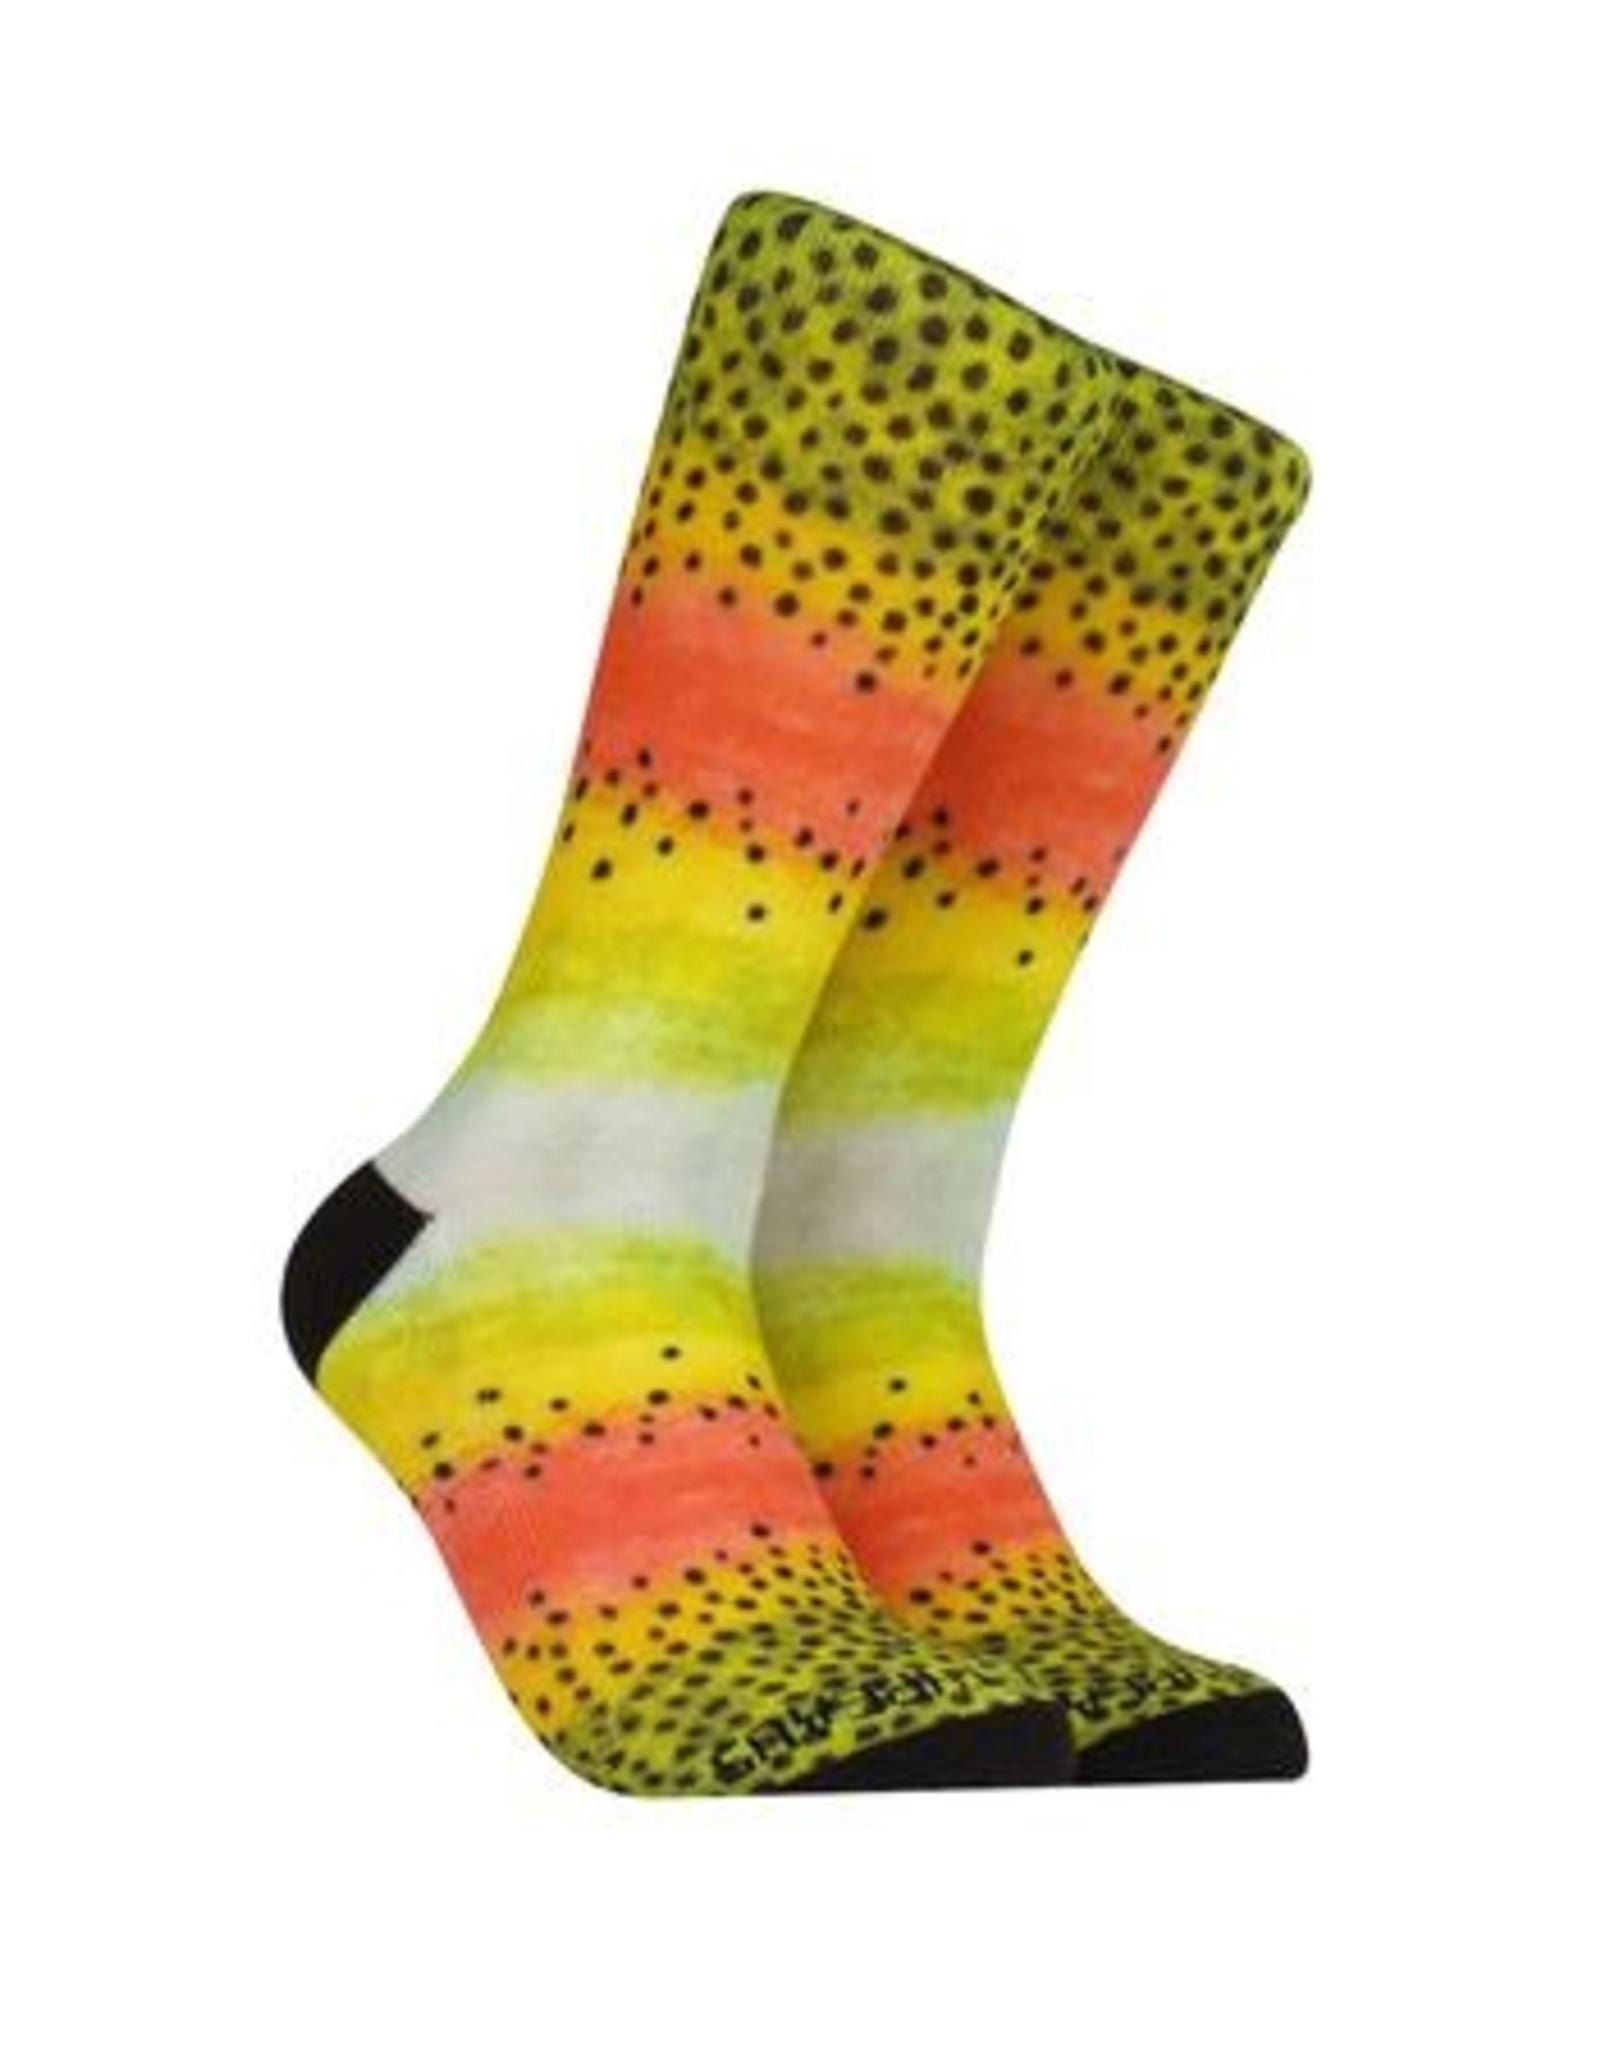 Reel Threads Reel Threads Socks